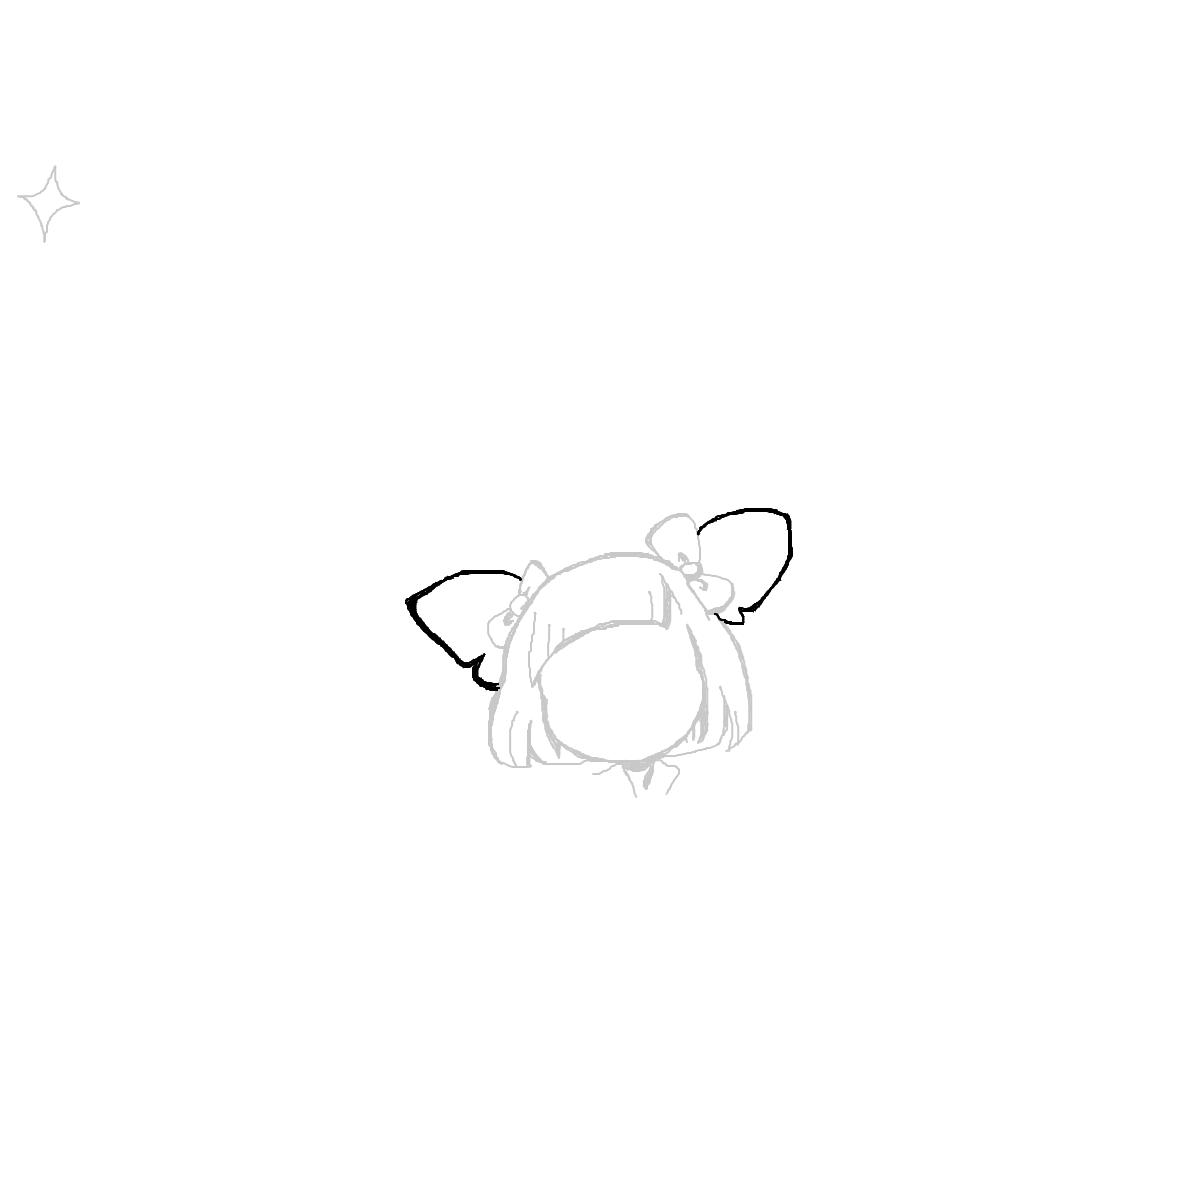 BAAAM drawing#23653 lat:41.0459442138671900lng: -79.6111145019531200